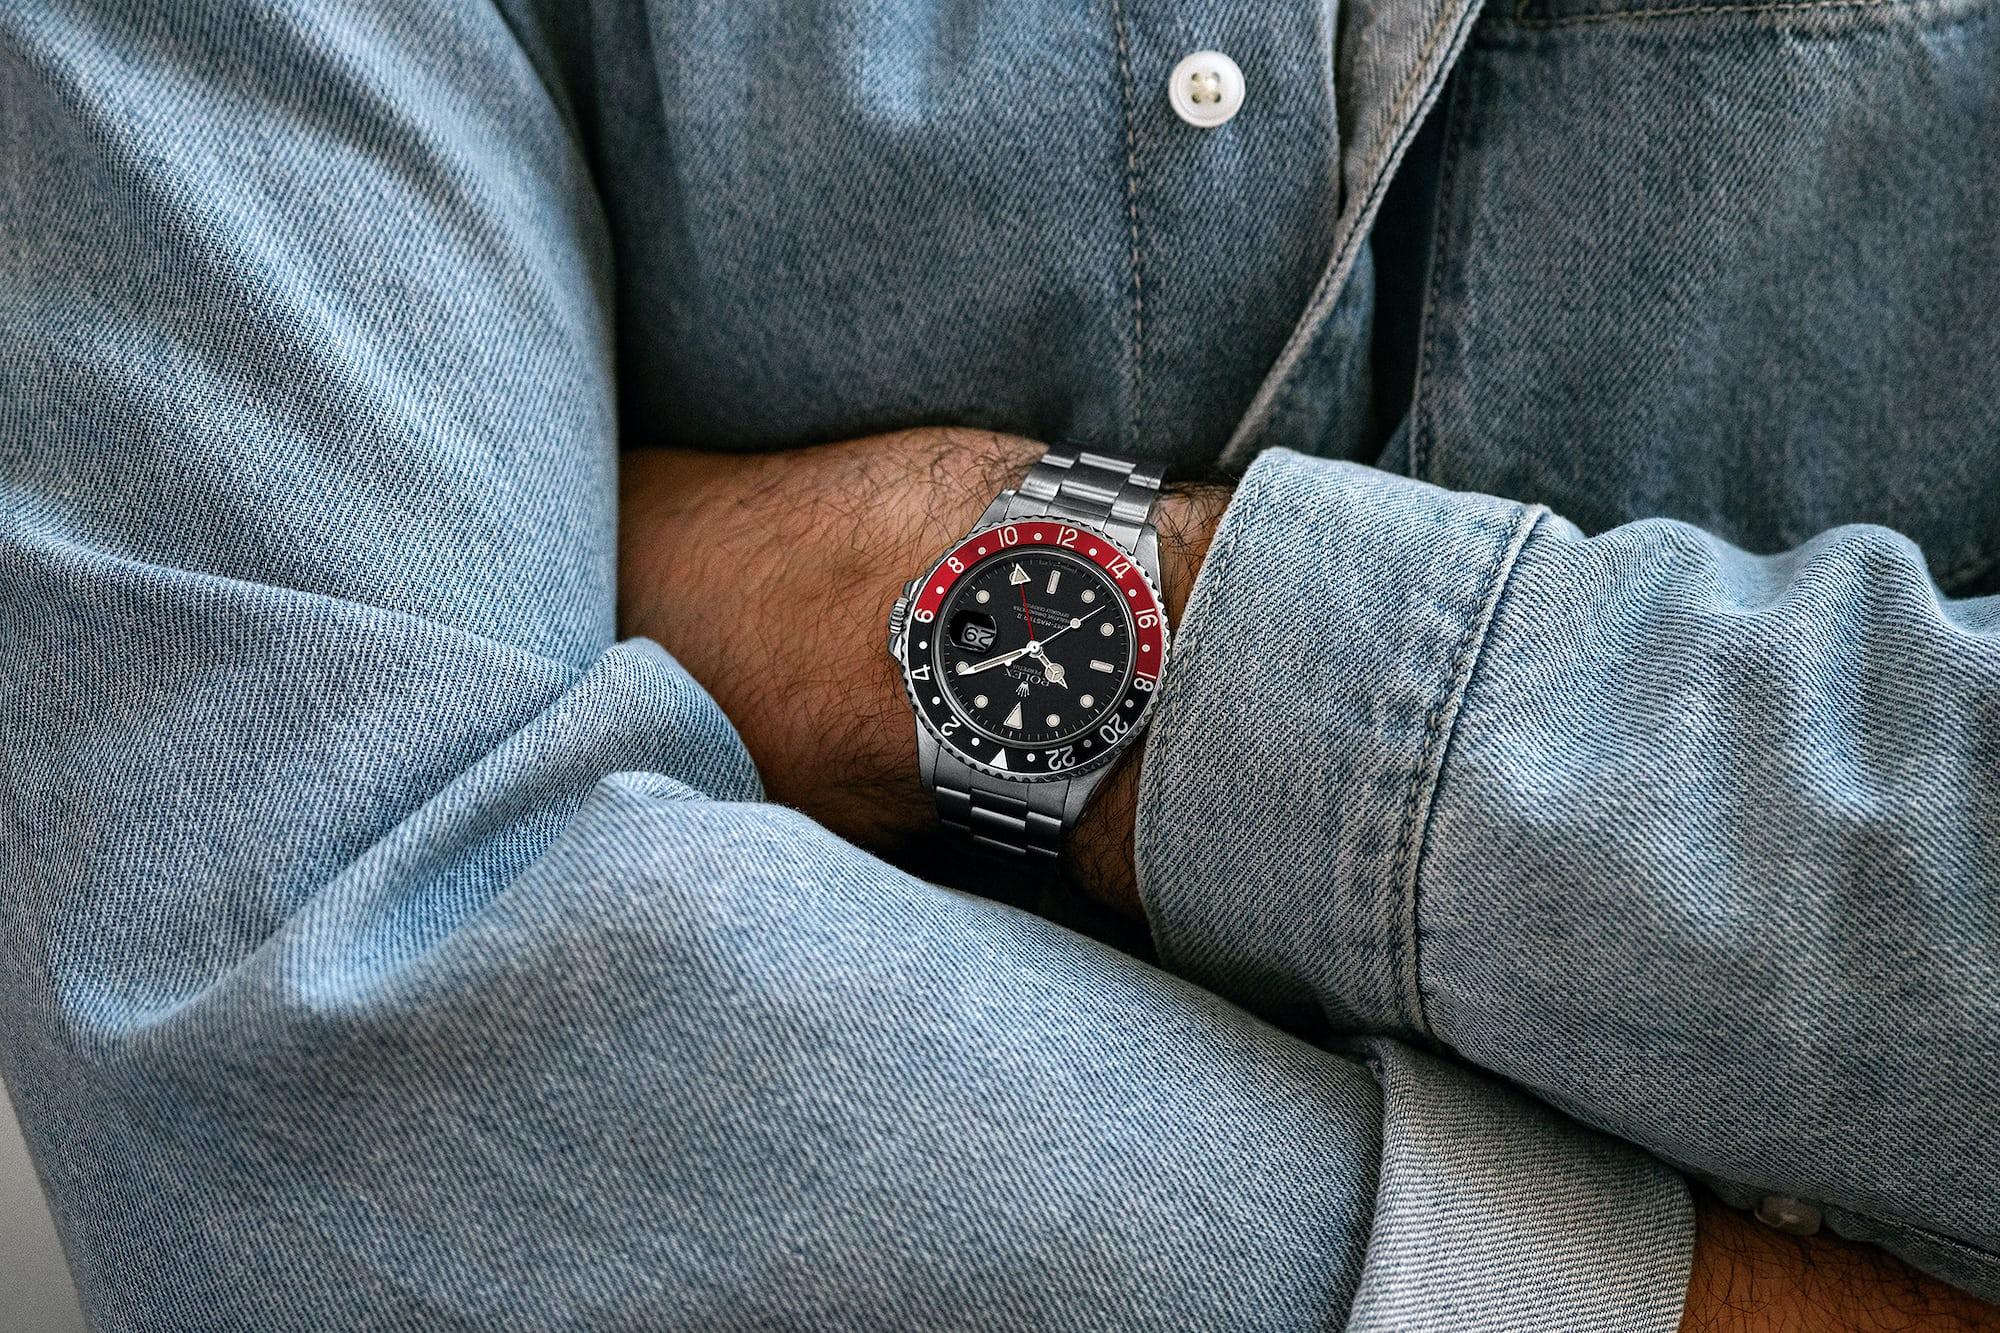 "<p><a href=""https://shop.hodinkee.com/products/gmt-master-ii-ref-16760-case-8366306"" rel=""noopener"" target=""_blank""><u>1984 Rolex GMT-Master II Ref. 16760</u></a></p>"